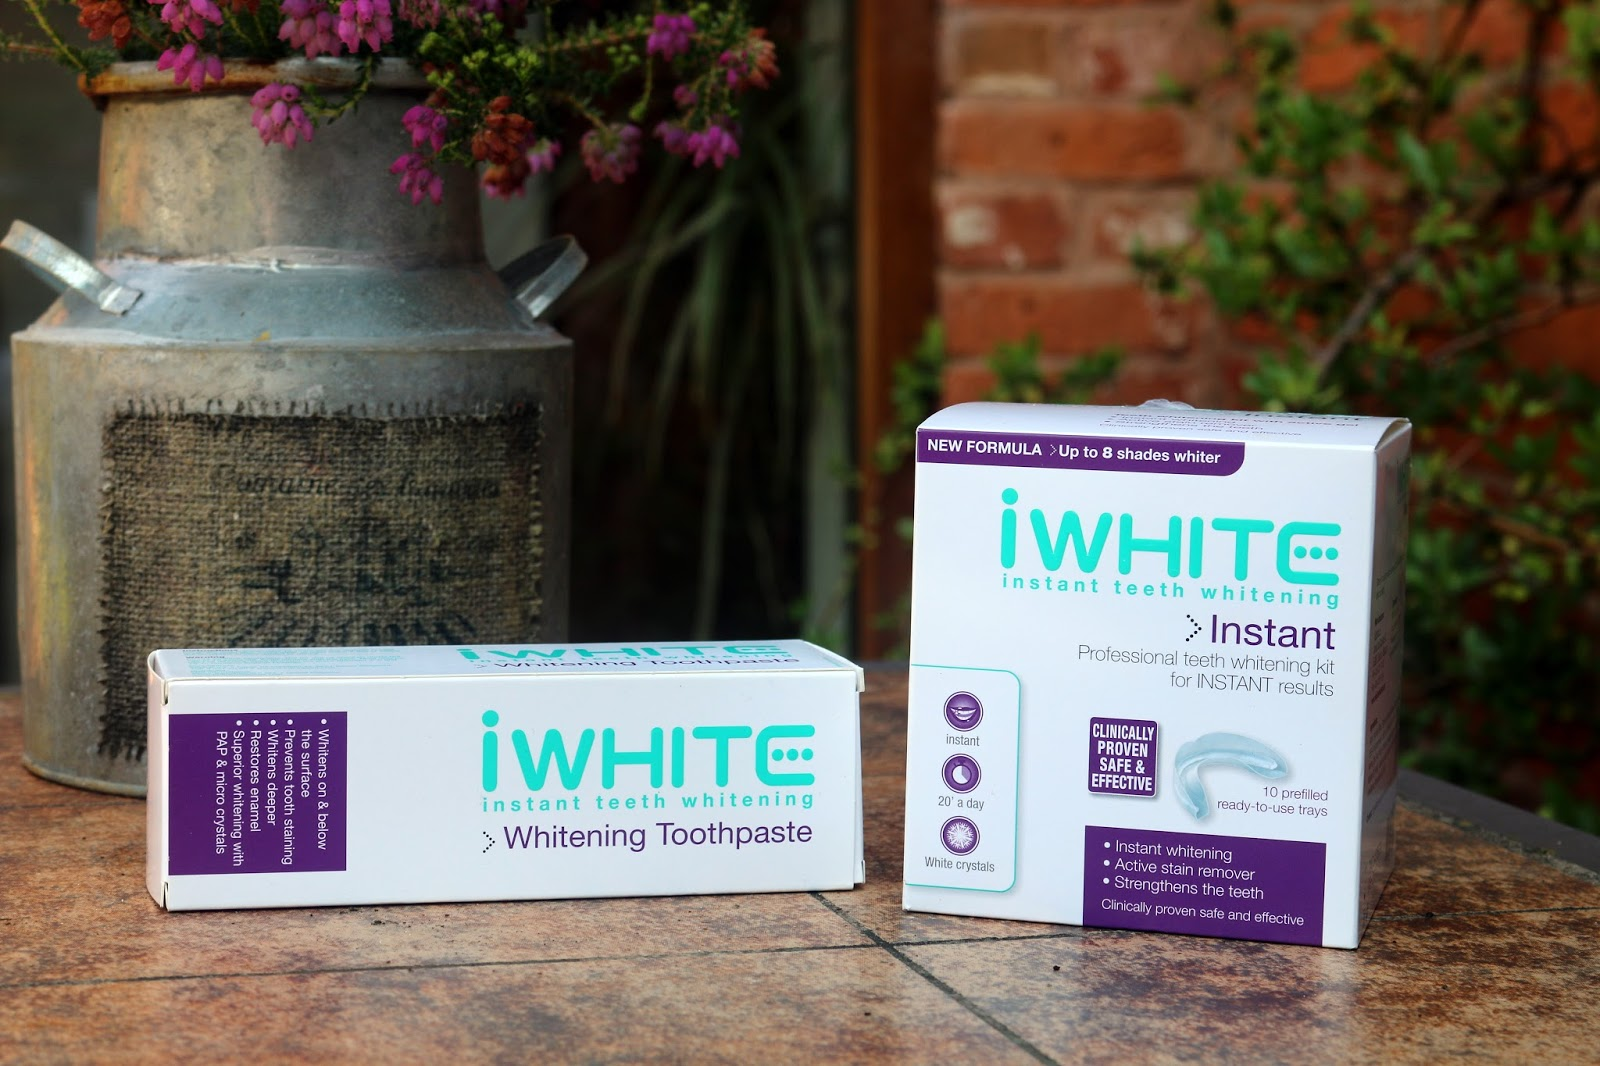 iWhite Instant Teeth Whitening